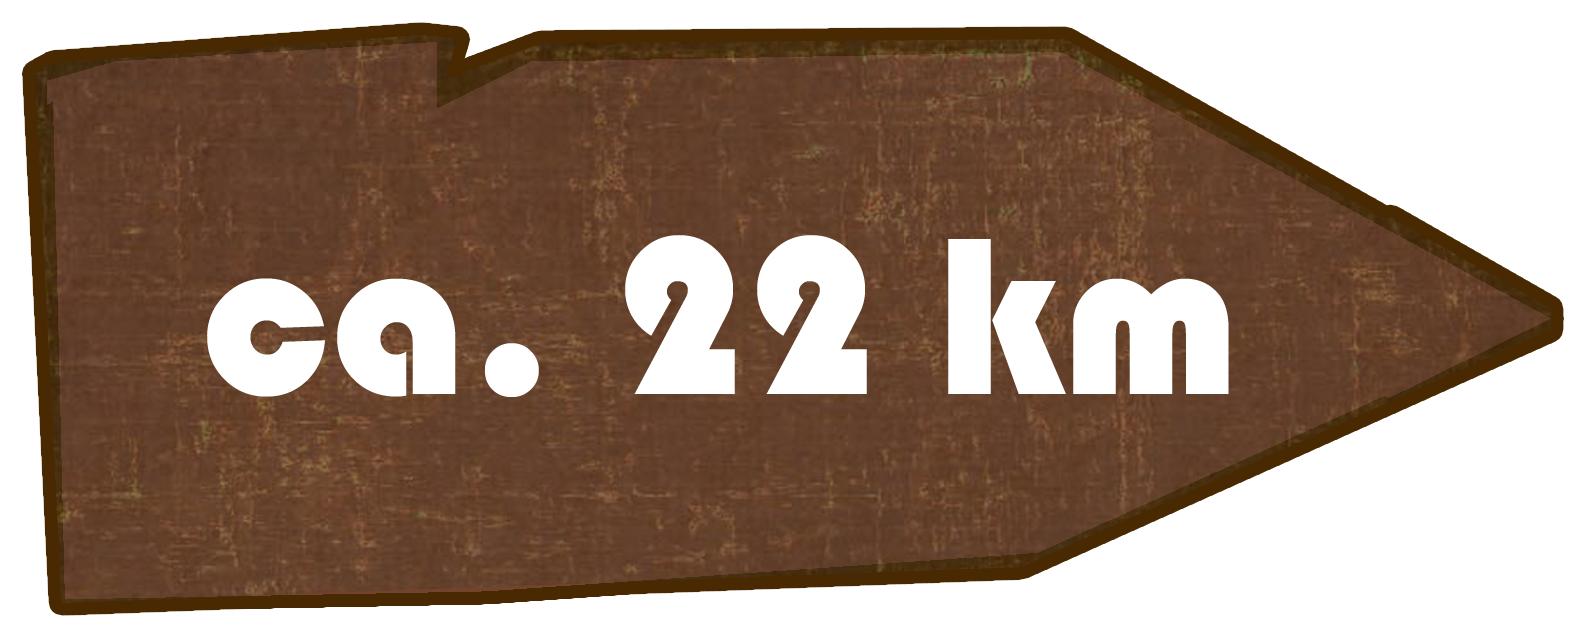 Kilometer Obercunnersdorf - Niedercunnersdorf - Löbau - Herwigsdorf - Strahlwalde - Obercunnersdorf